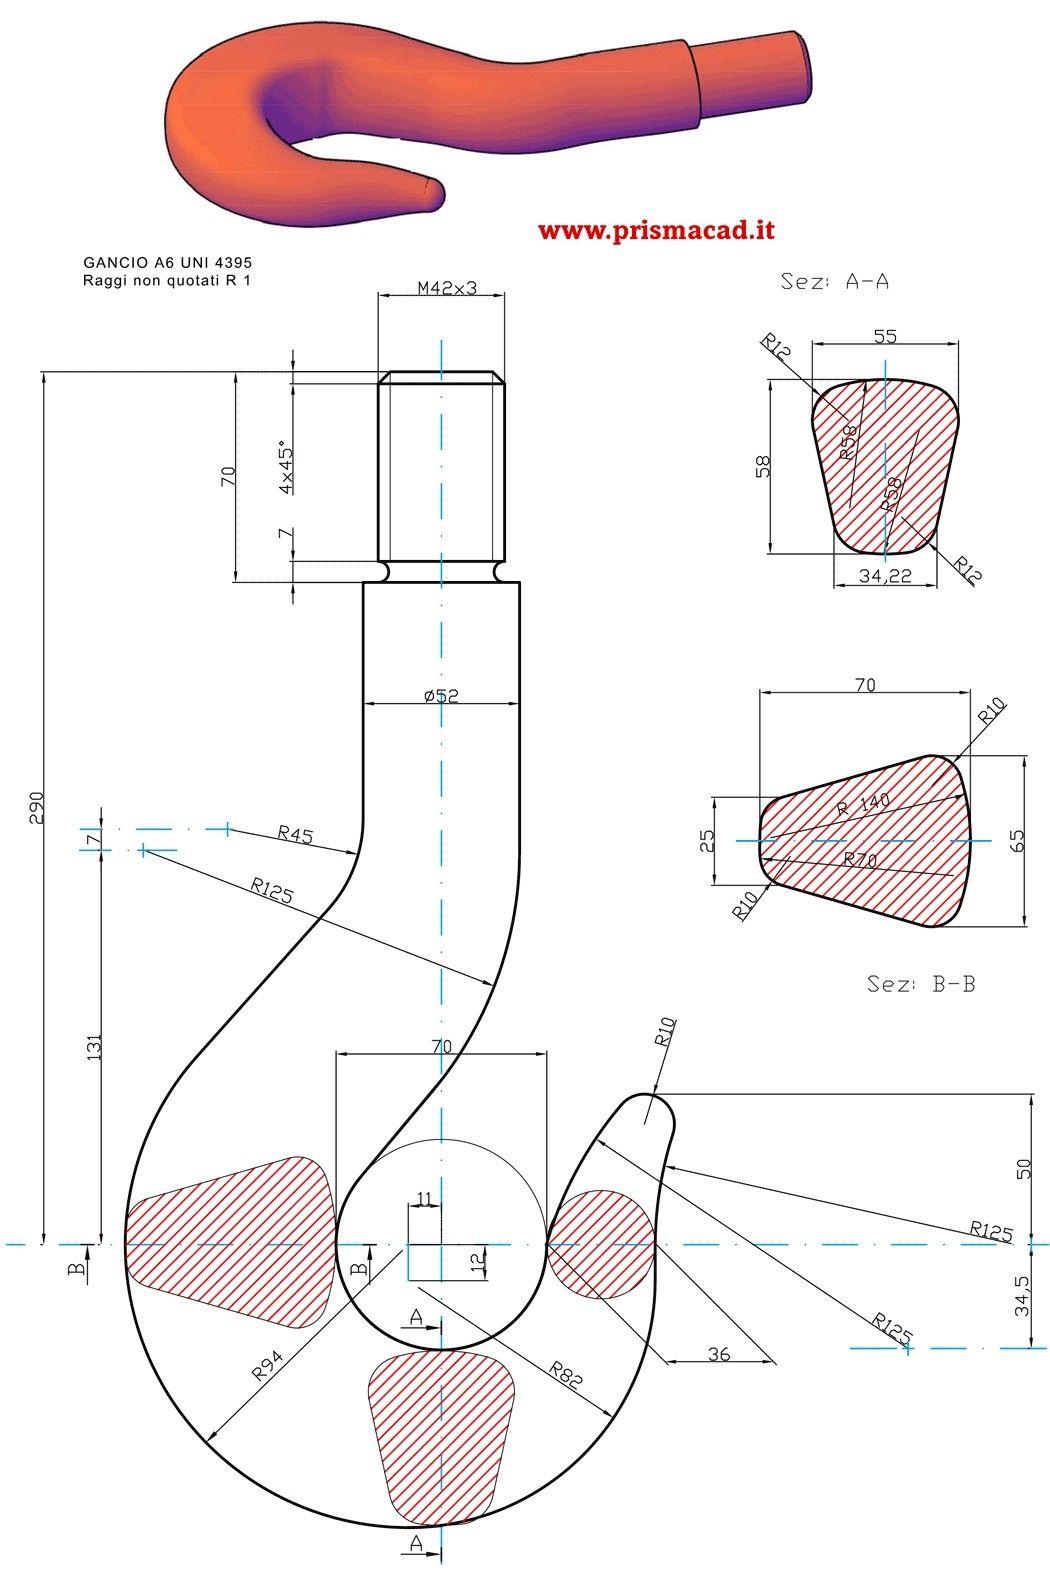 Gancio Autocad Isometric Drawing Technical Drawing Mechanical Design